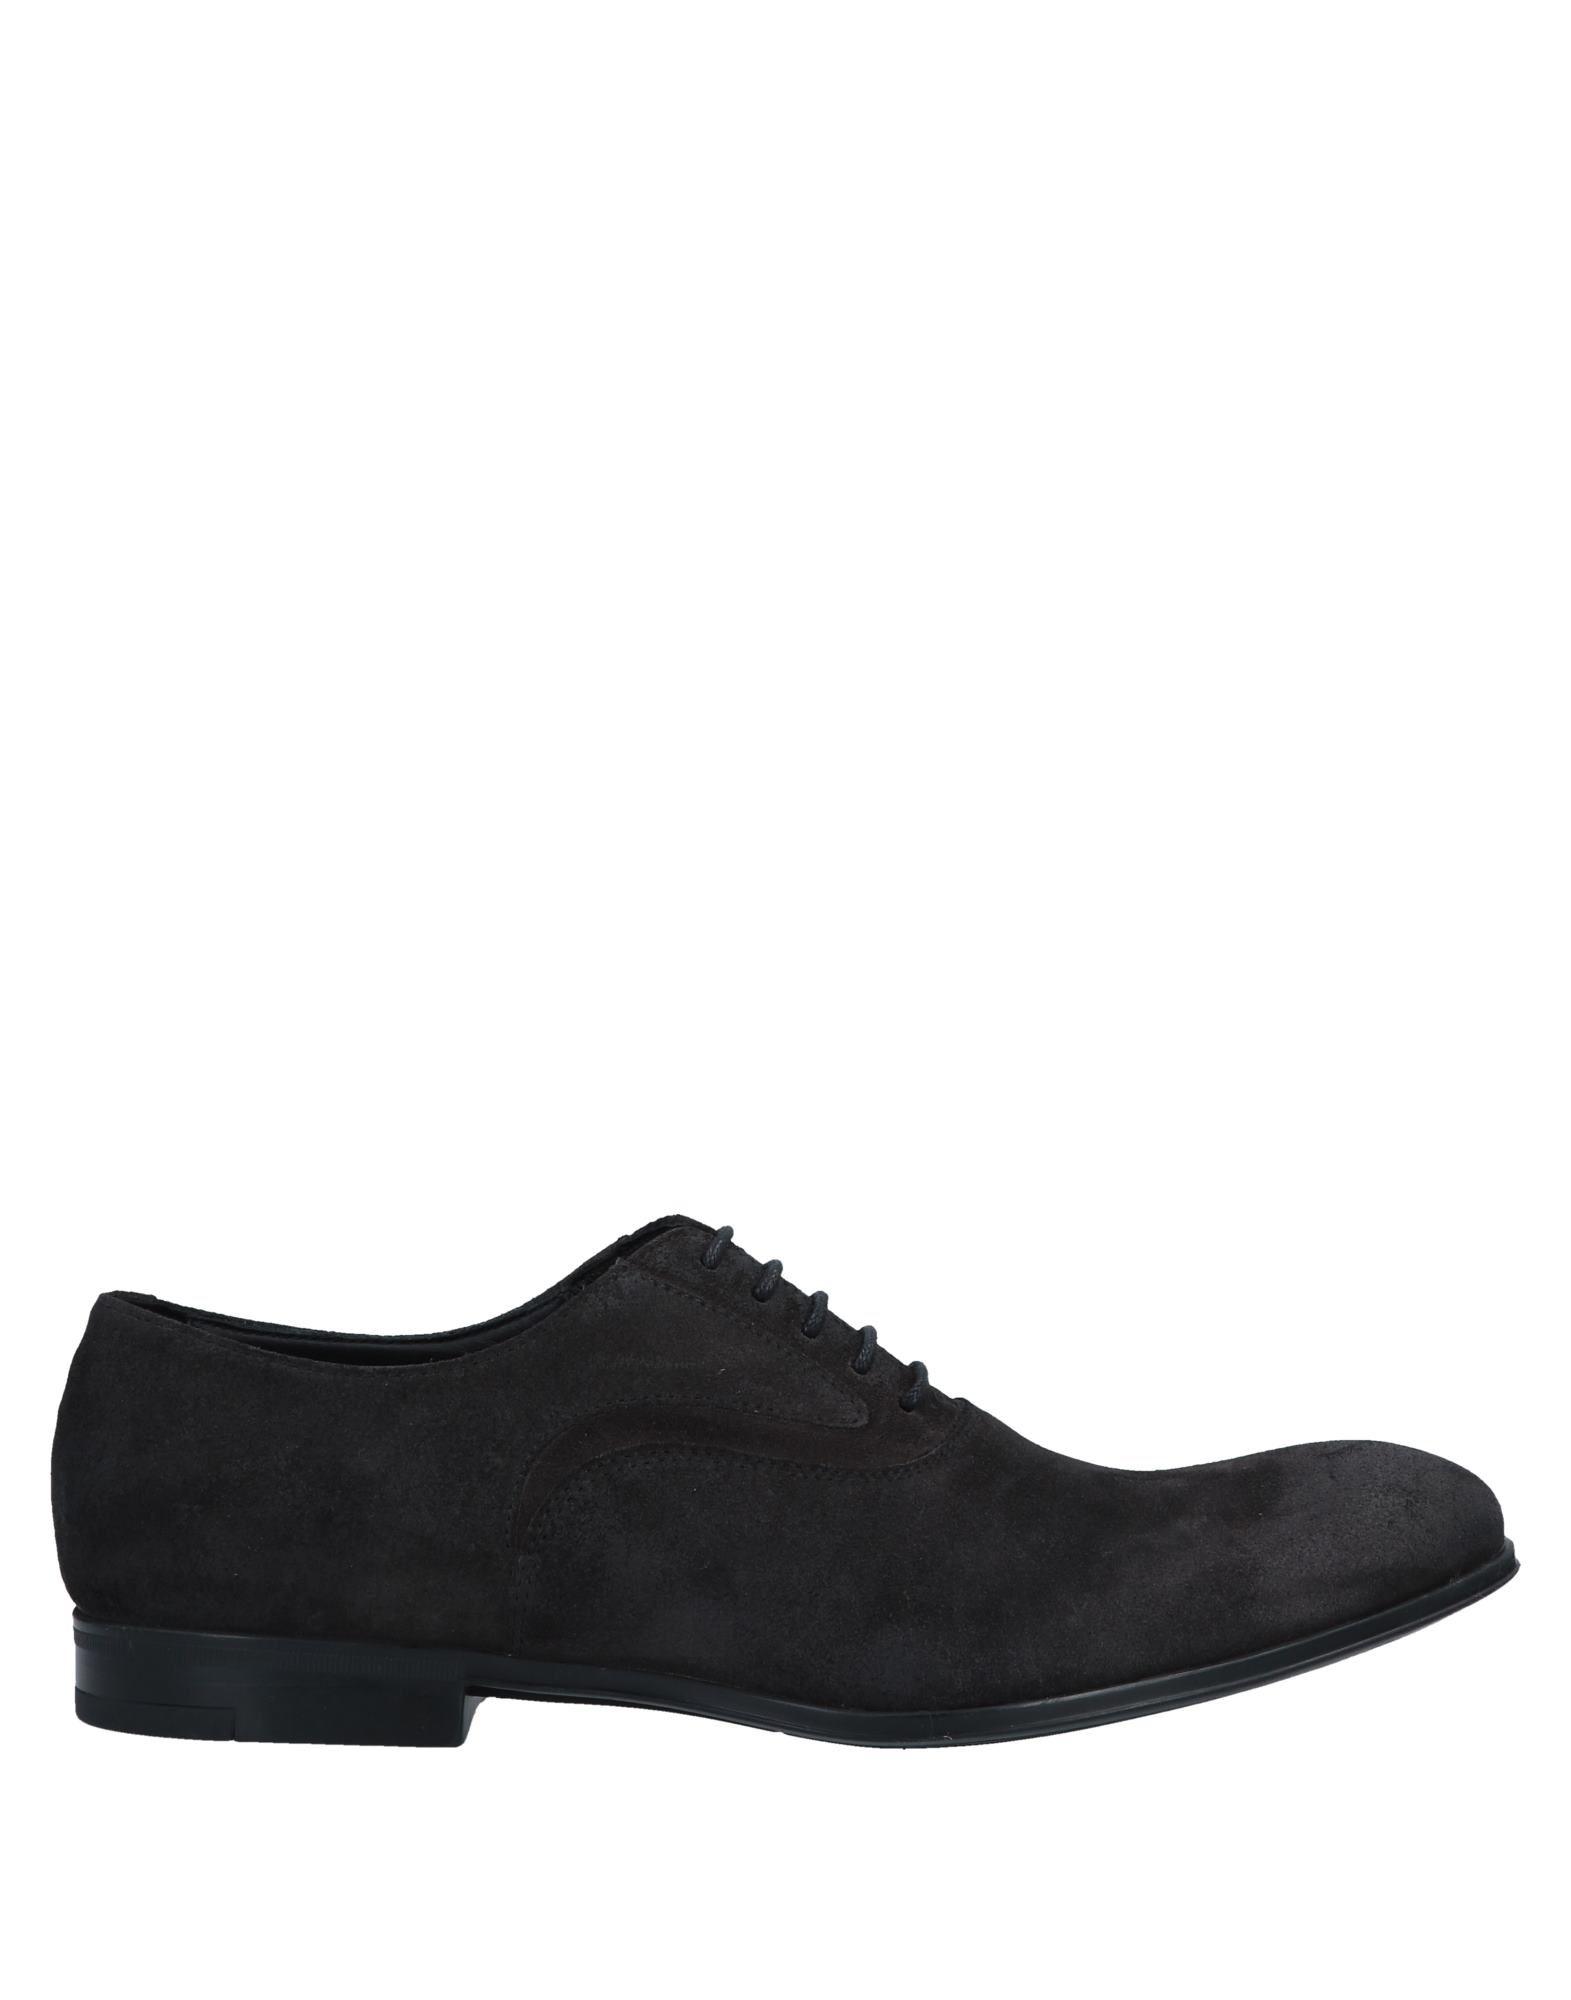 DOUCAL'S Обувь на шнурках первый внутри обувь обувь обувь обувь обувь обувь обувь обувь обувь 8a2549 мужская армия green 40 метров